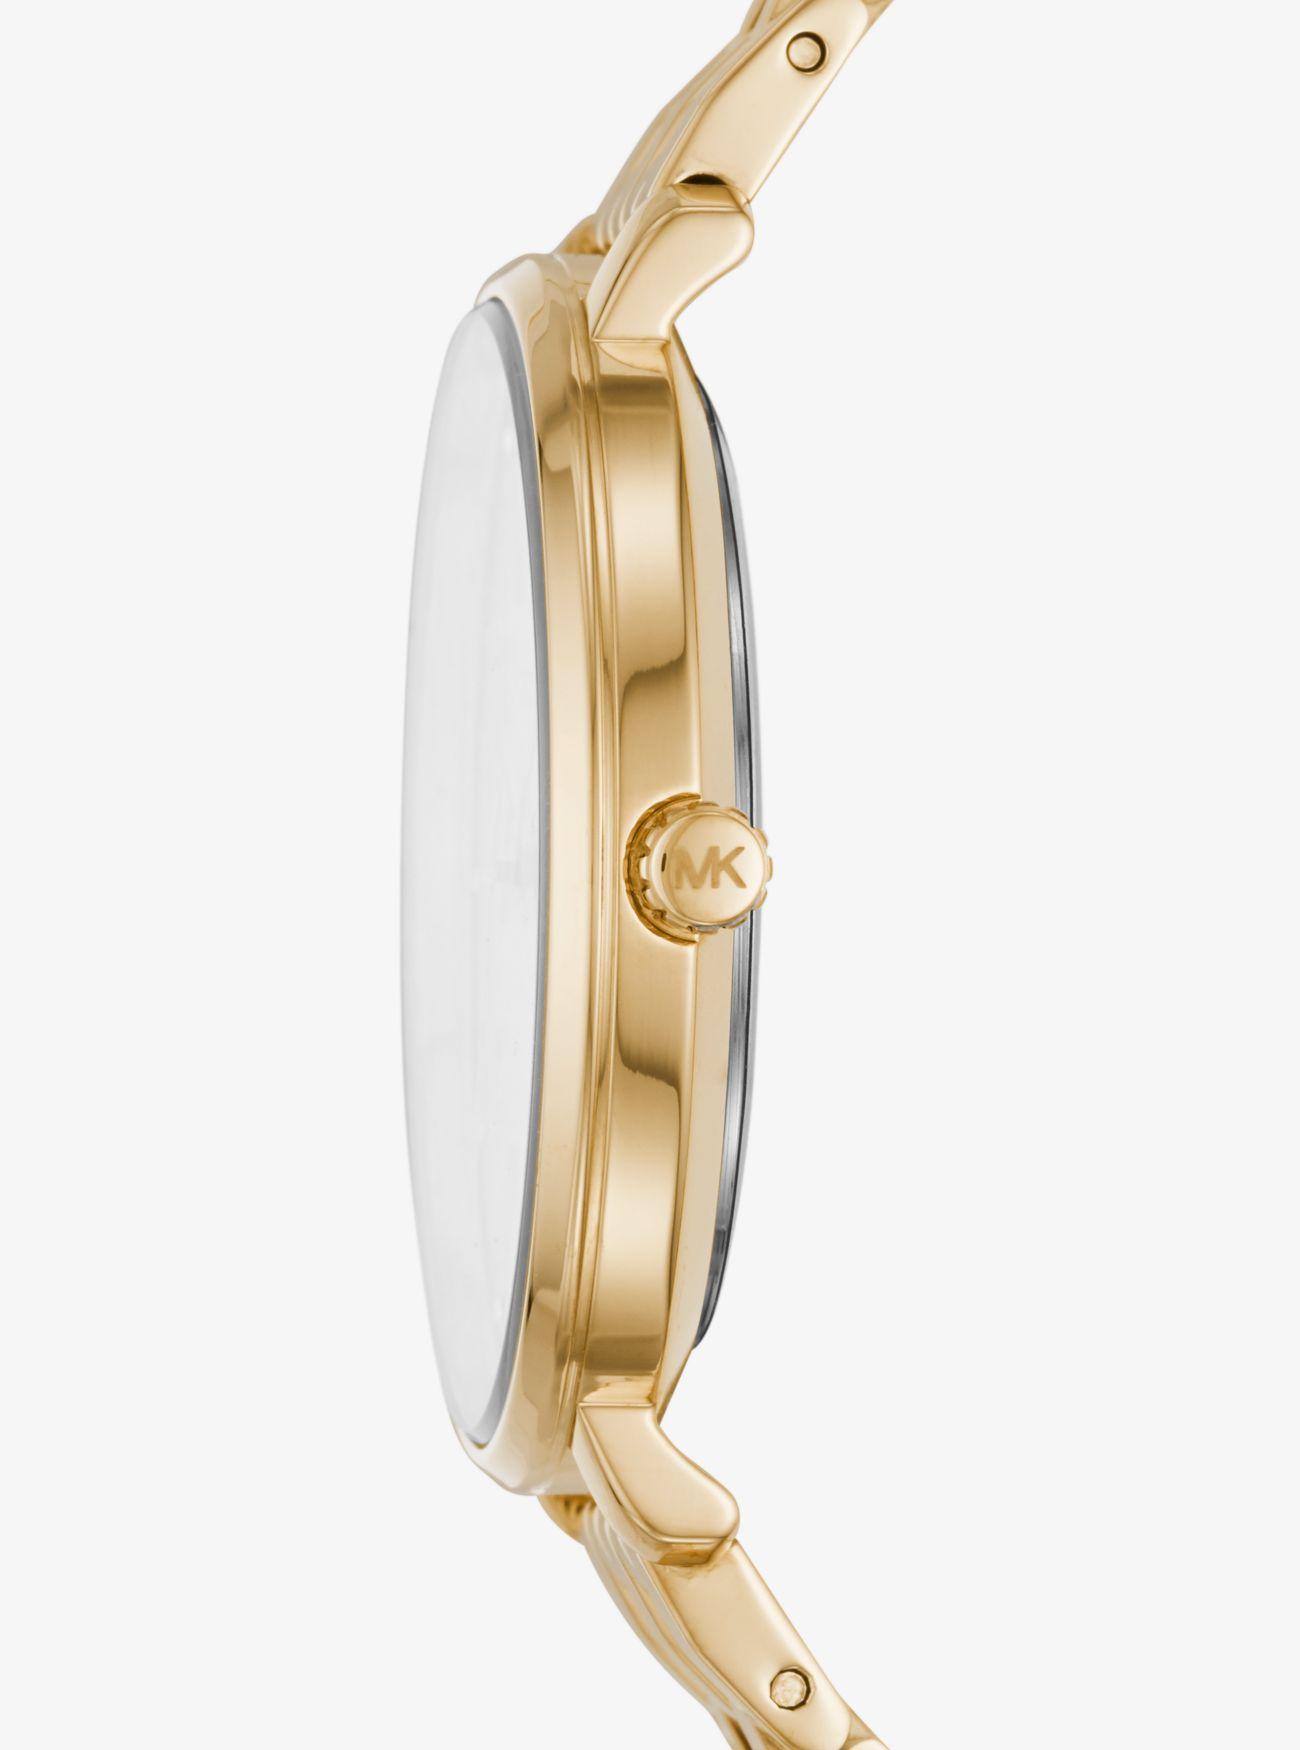 ddb719e5c2db4 Pyper Gold-Tone Watch Pyper Gold-Tone Watch. MICHAEL KORS